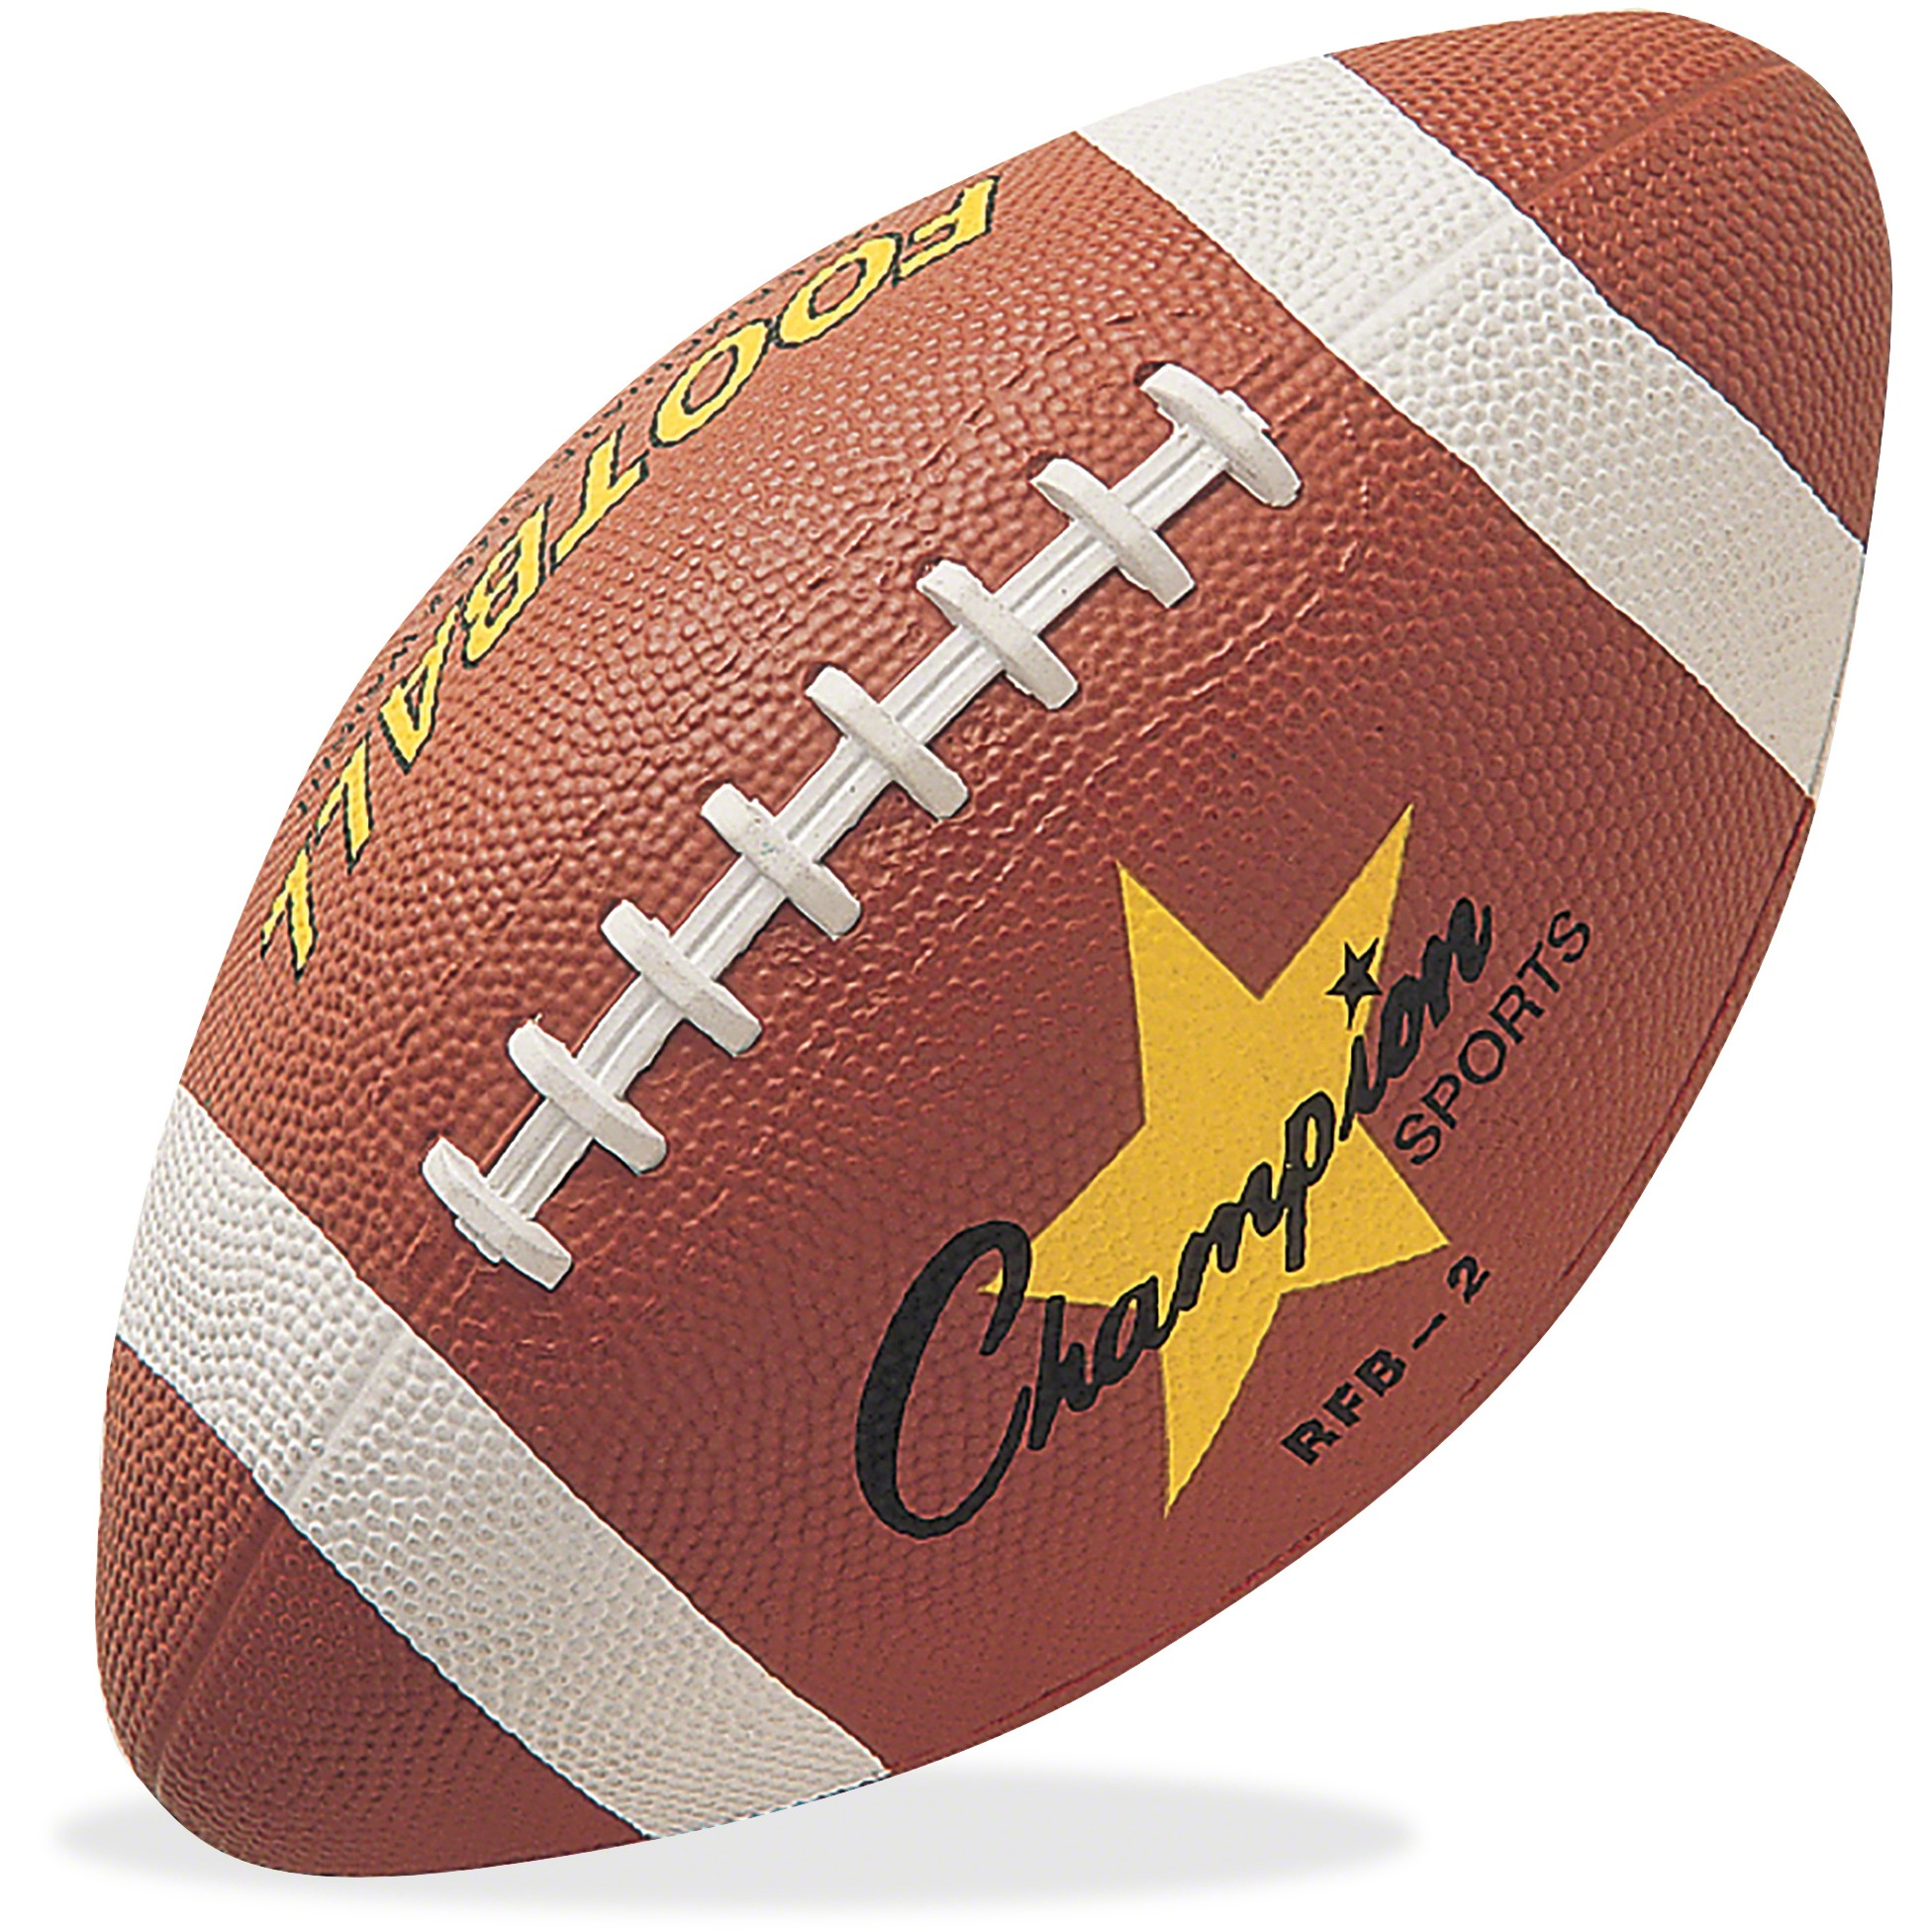 Champion Sport s Intermediate Size Football, Brown, 1 Each (Quantity) by CHAMPION SPORT